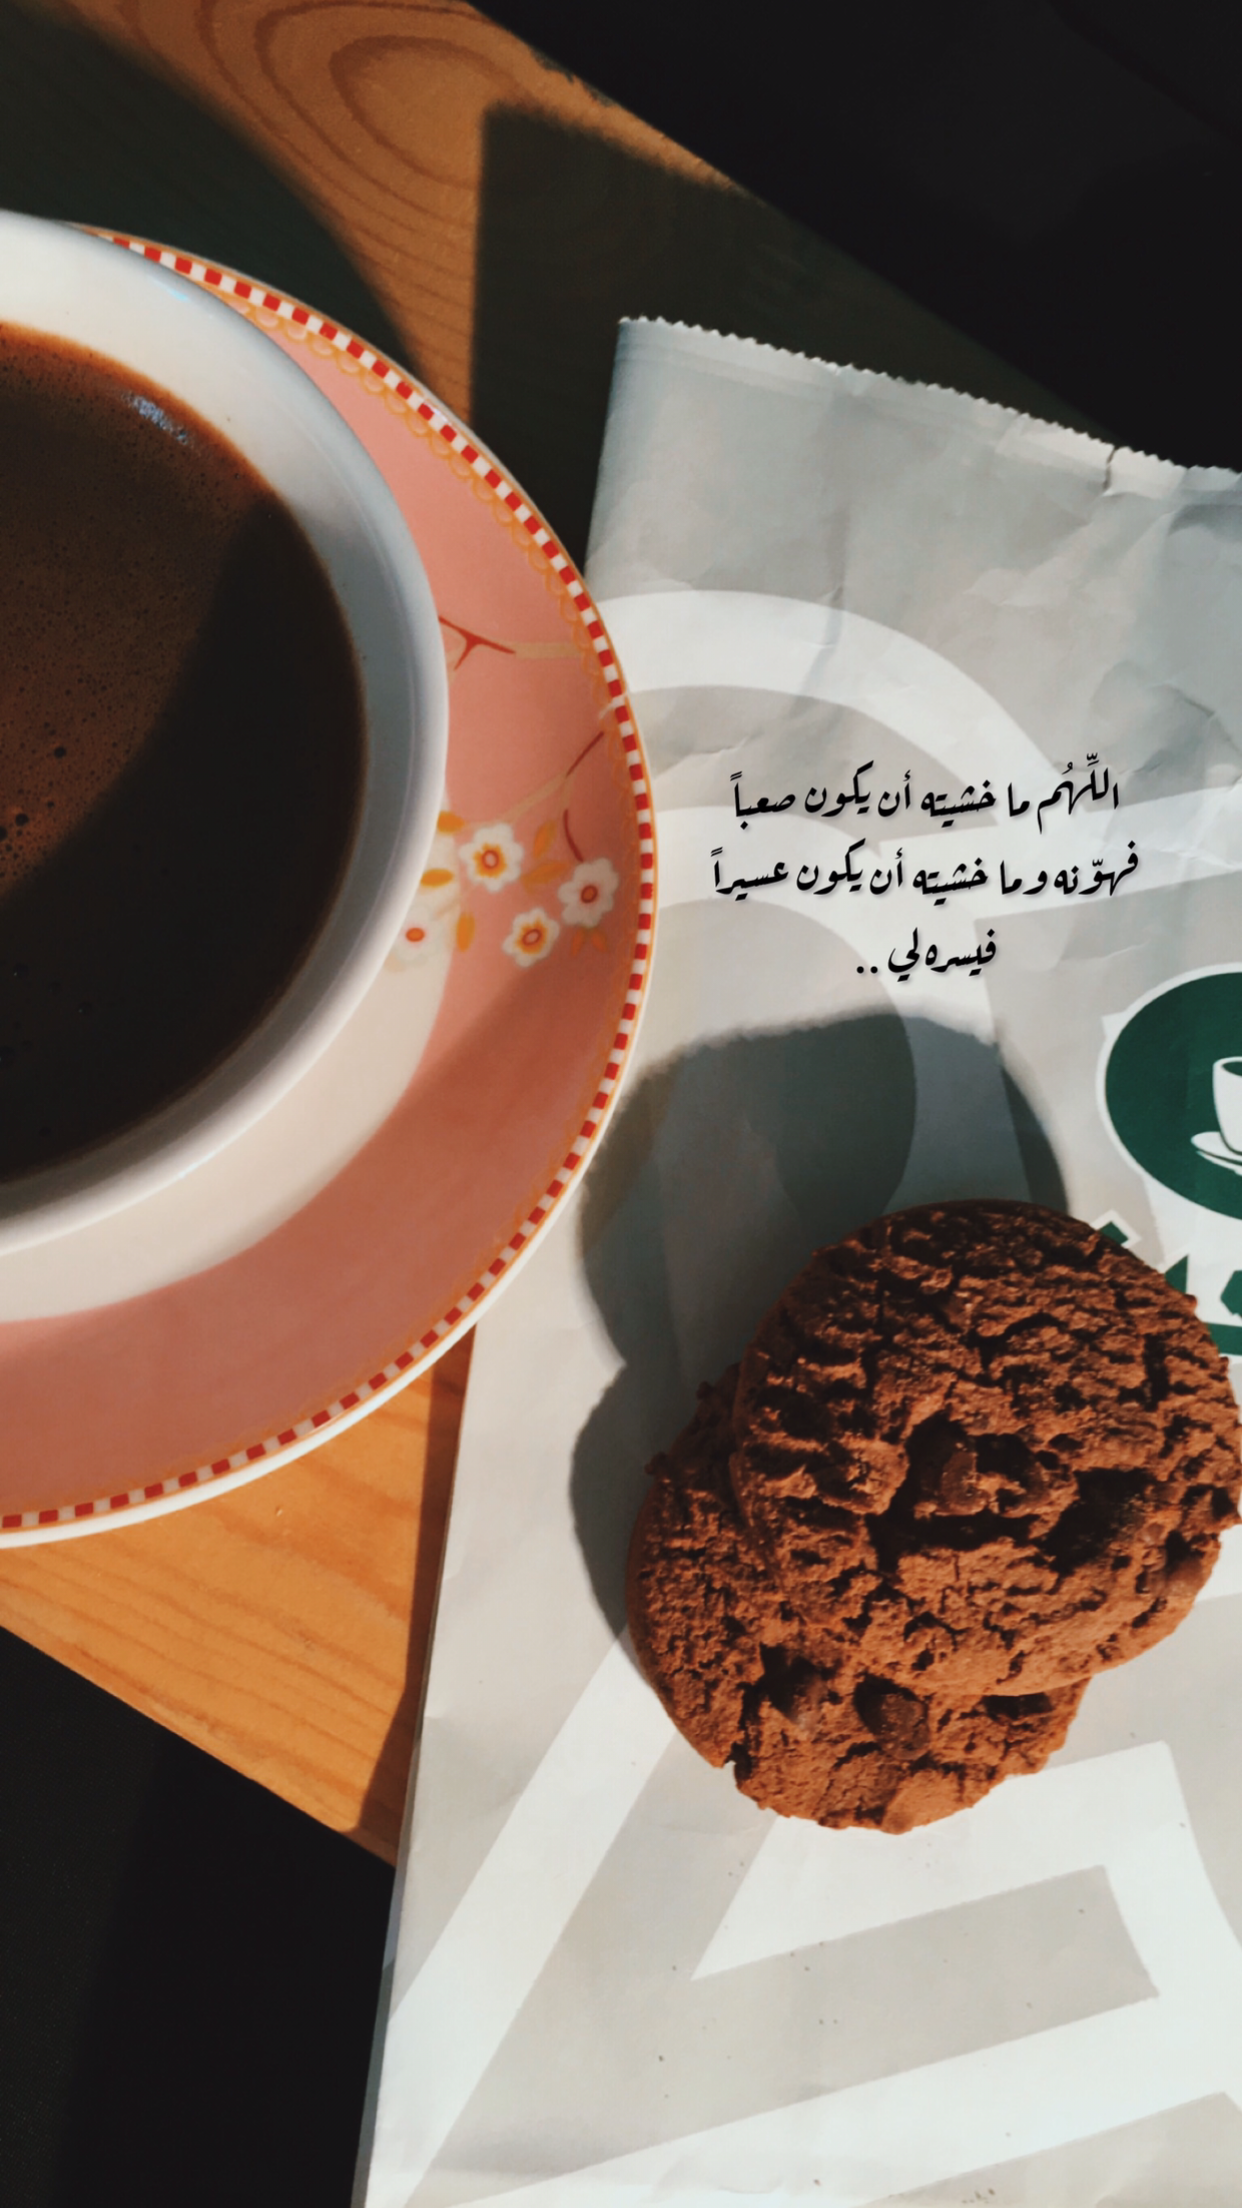 pin by شوق العتيبي on losh coffee box arabic love quotes